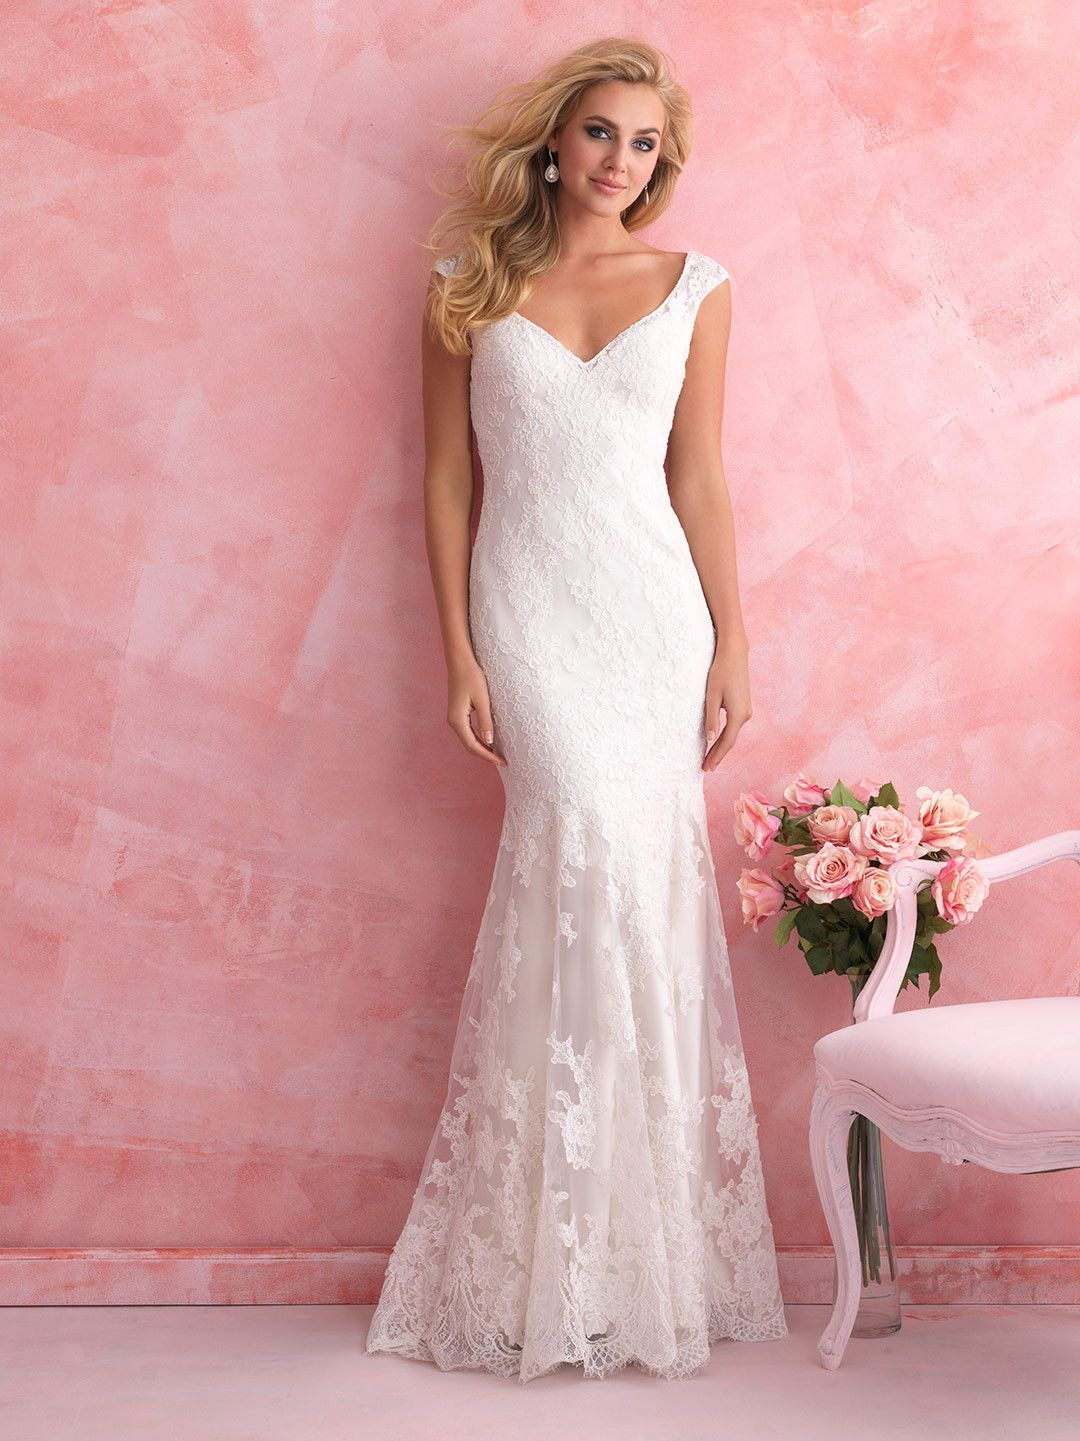 Pin by Madison Diehl on Wedding Dresses Galore | Pinterest | Wedding ...